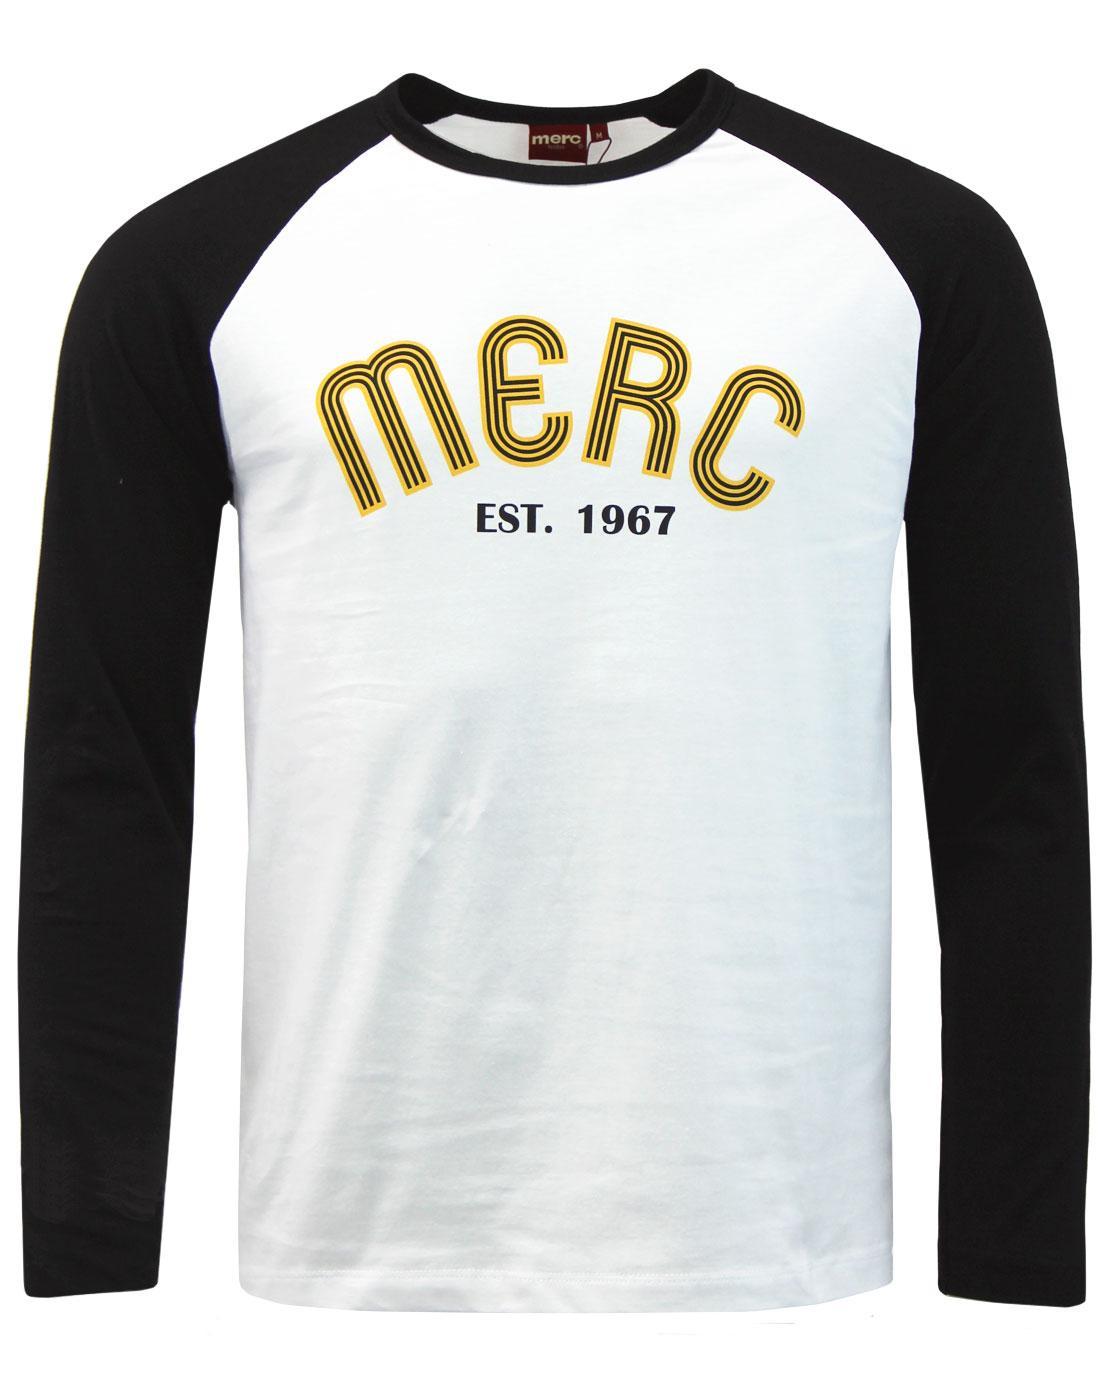 Fairdene MERC Retro 90s Archive Print Baseball Tee